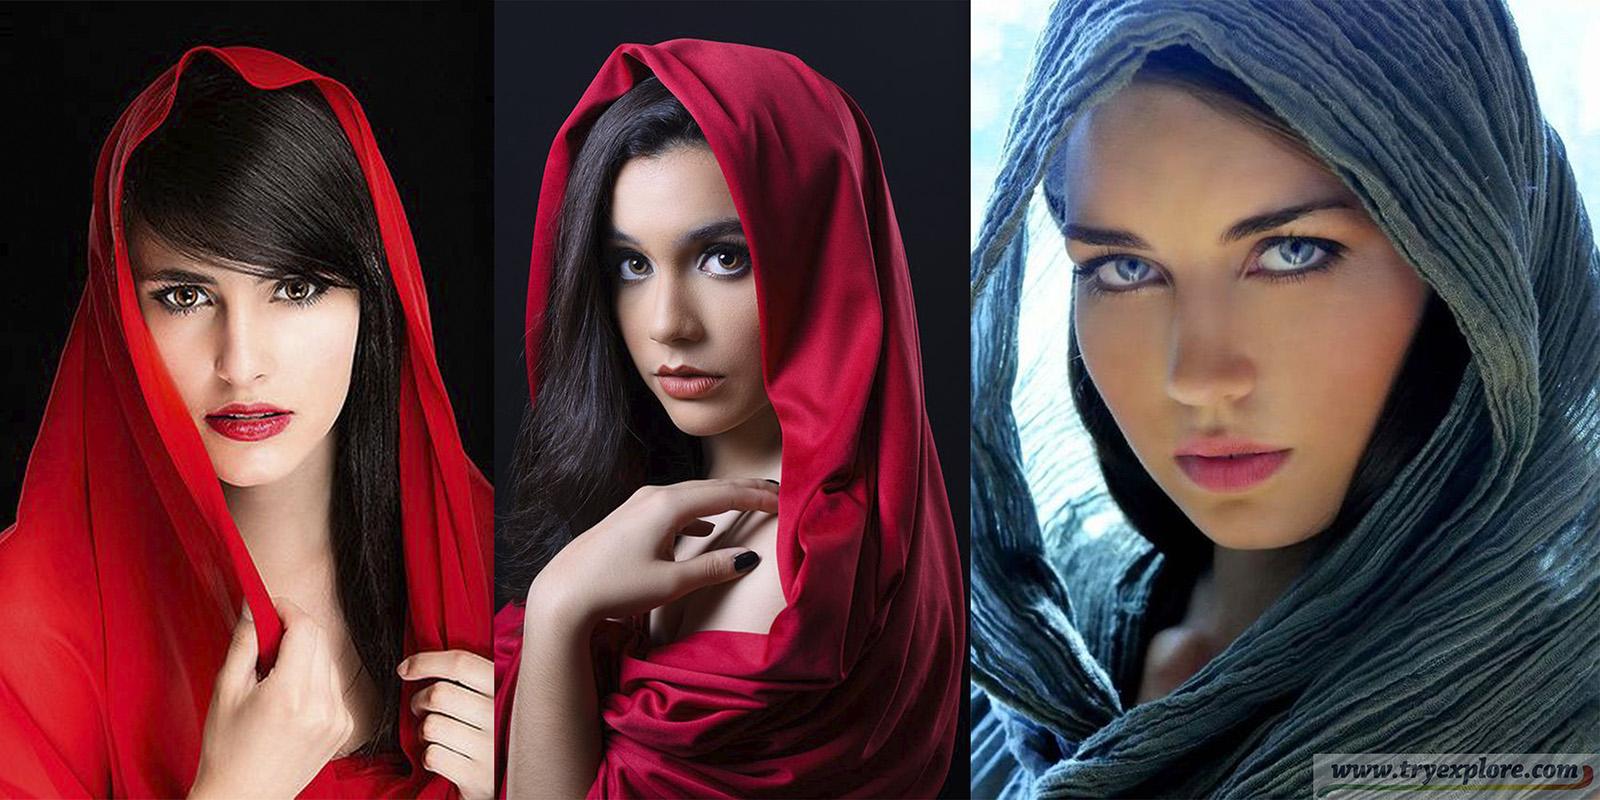 Mujeres Árabes bellas tryexplore